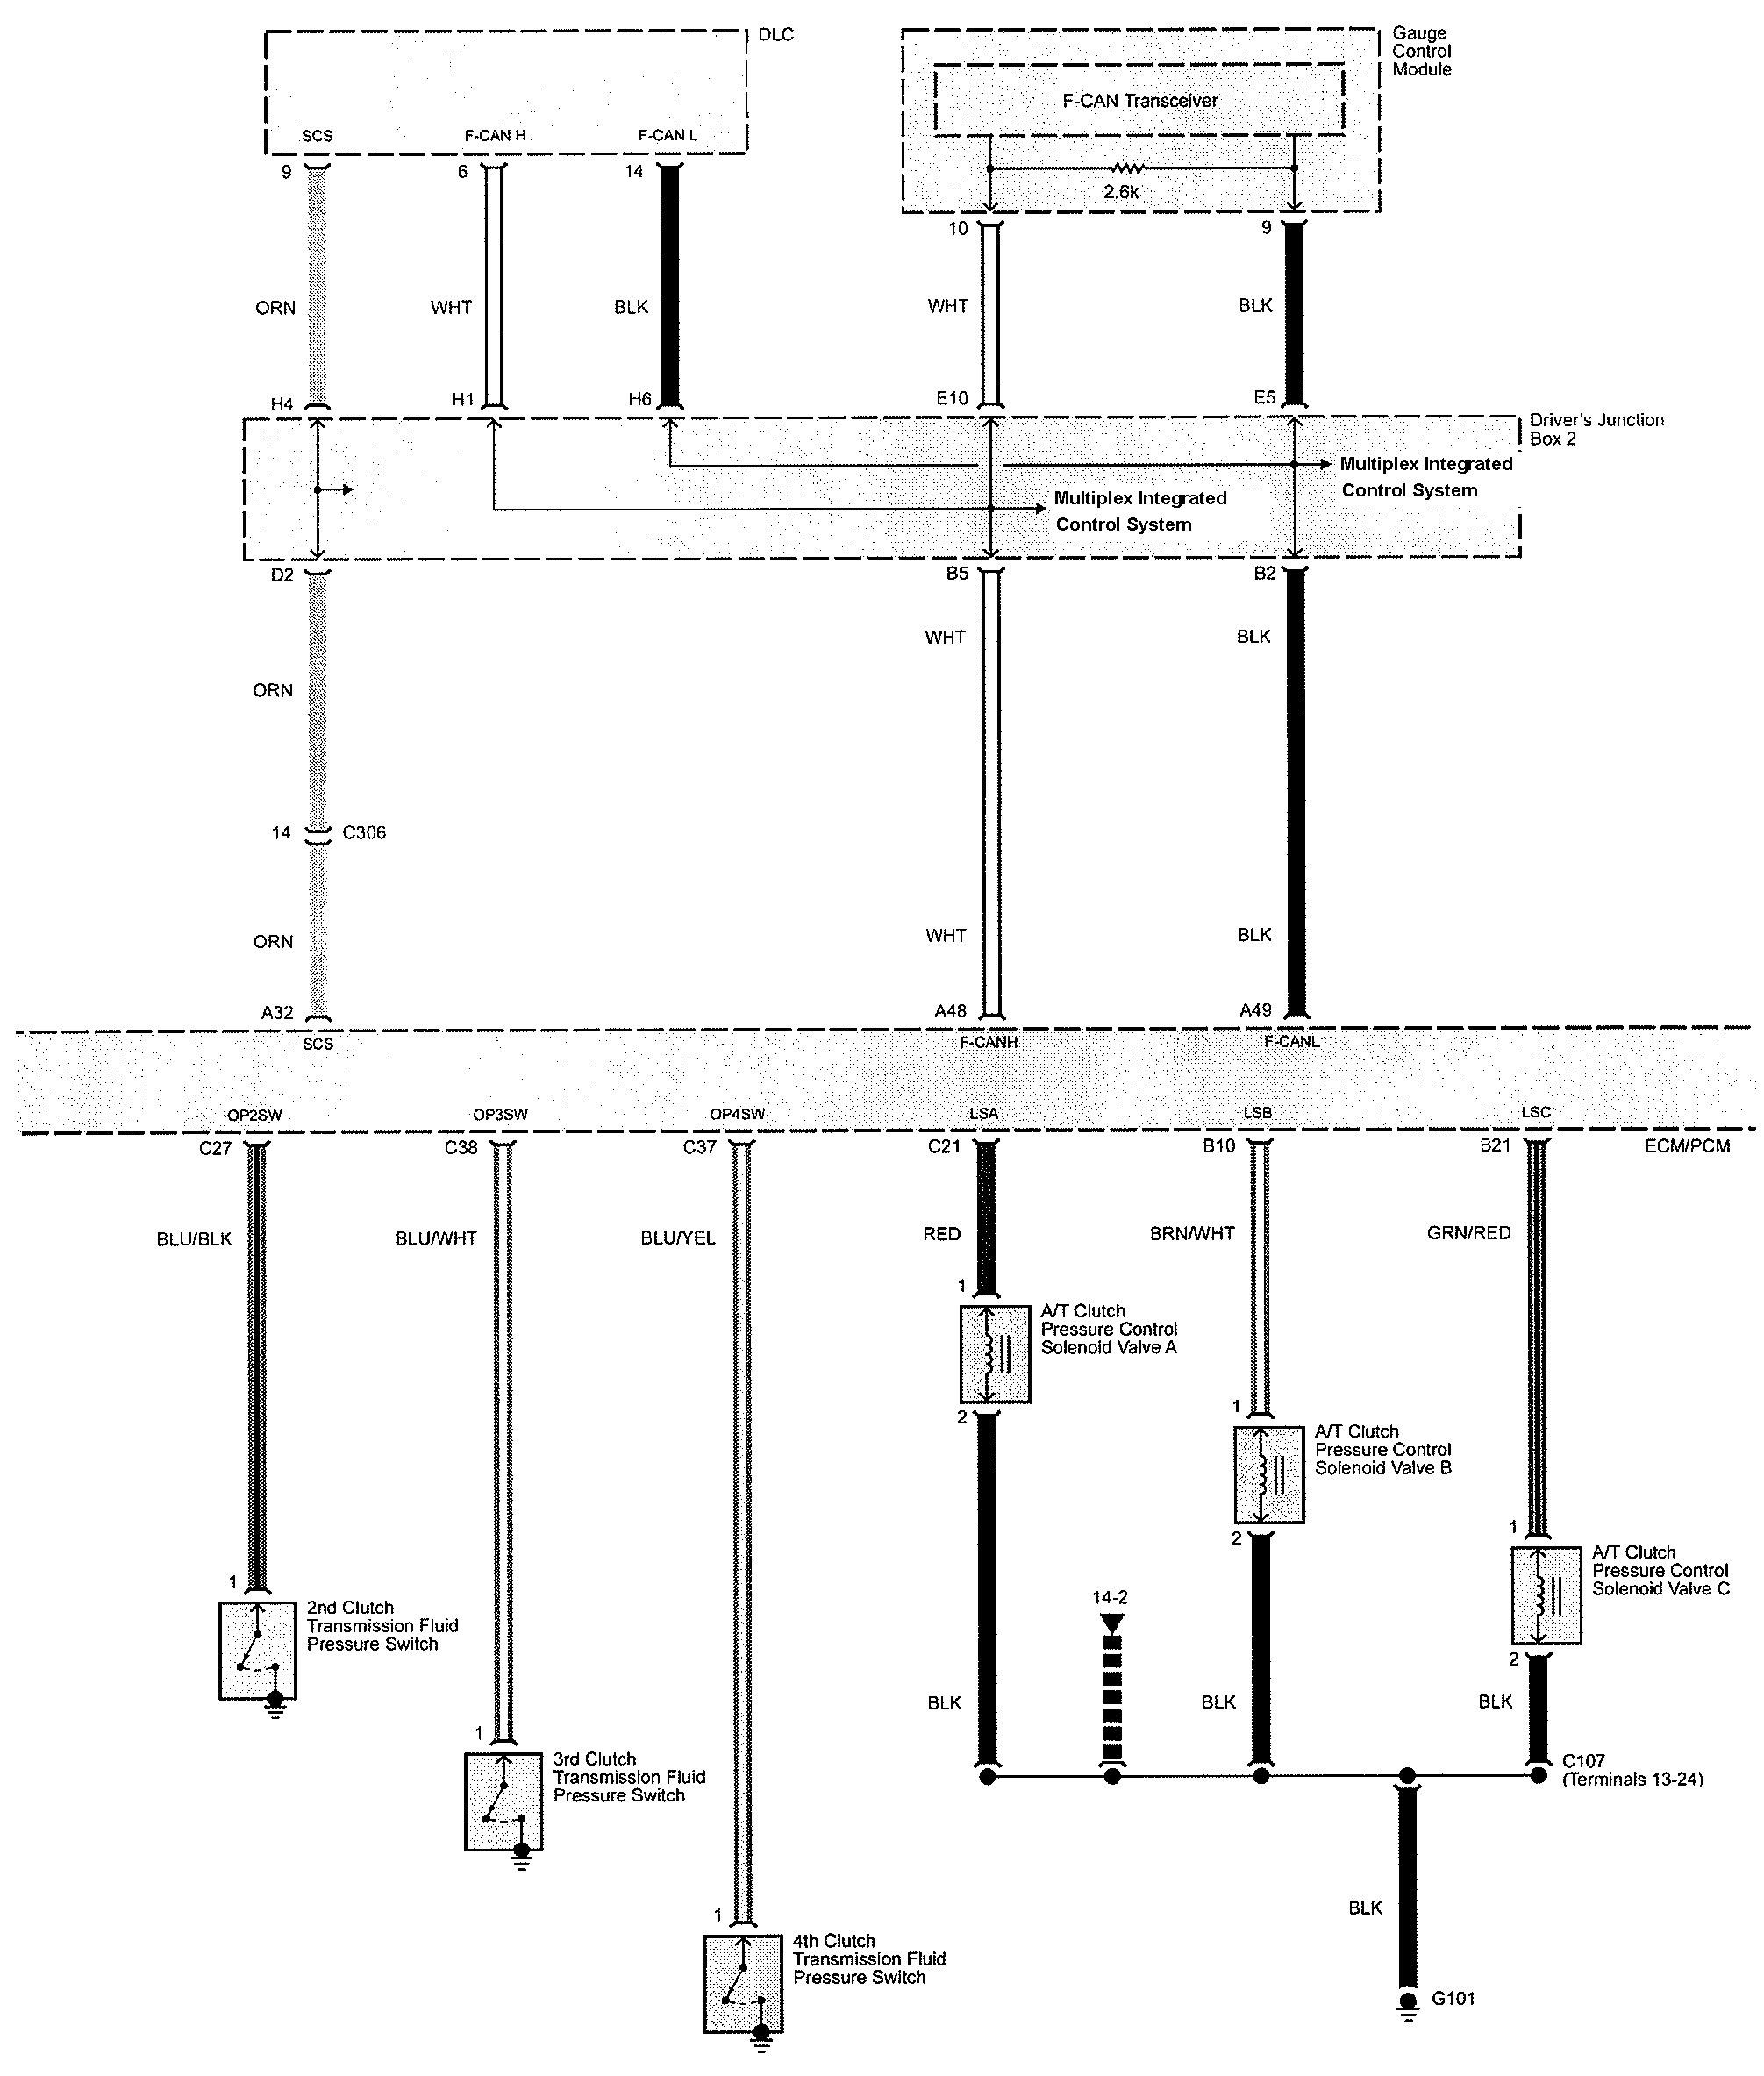 Acura TL (2009) – wiring diagrams – transmission controls ... on mdx transmission, maserati transmission, trabant transmission, honda transmission, kia transmission, renault transmission, porsche transmission, chrysler transmission, buell transmission, cobra transmission, peterbilt transmission, ford transmission, jaguar transmission, integra ls transmission, studebaker transmission, ssangyong transmission,